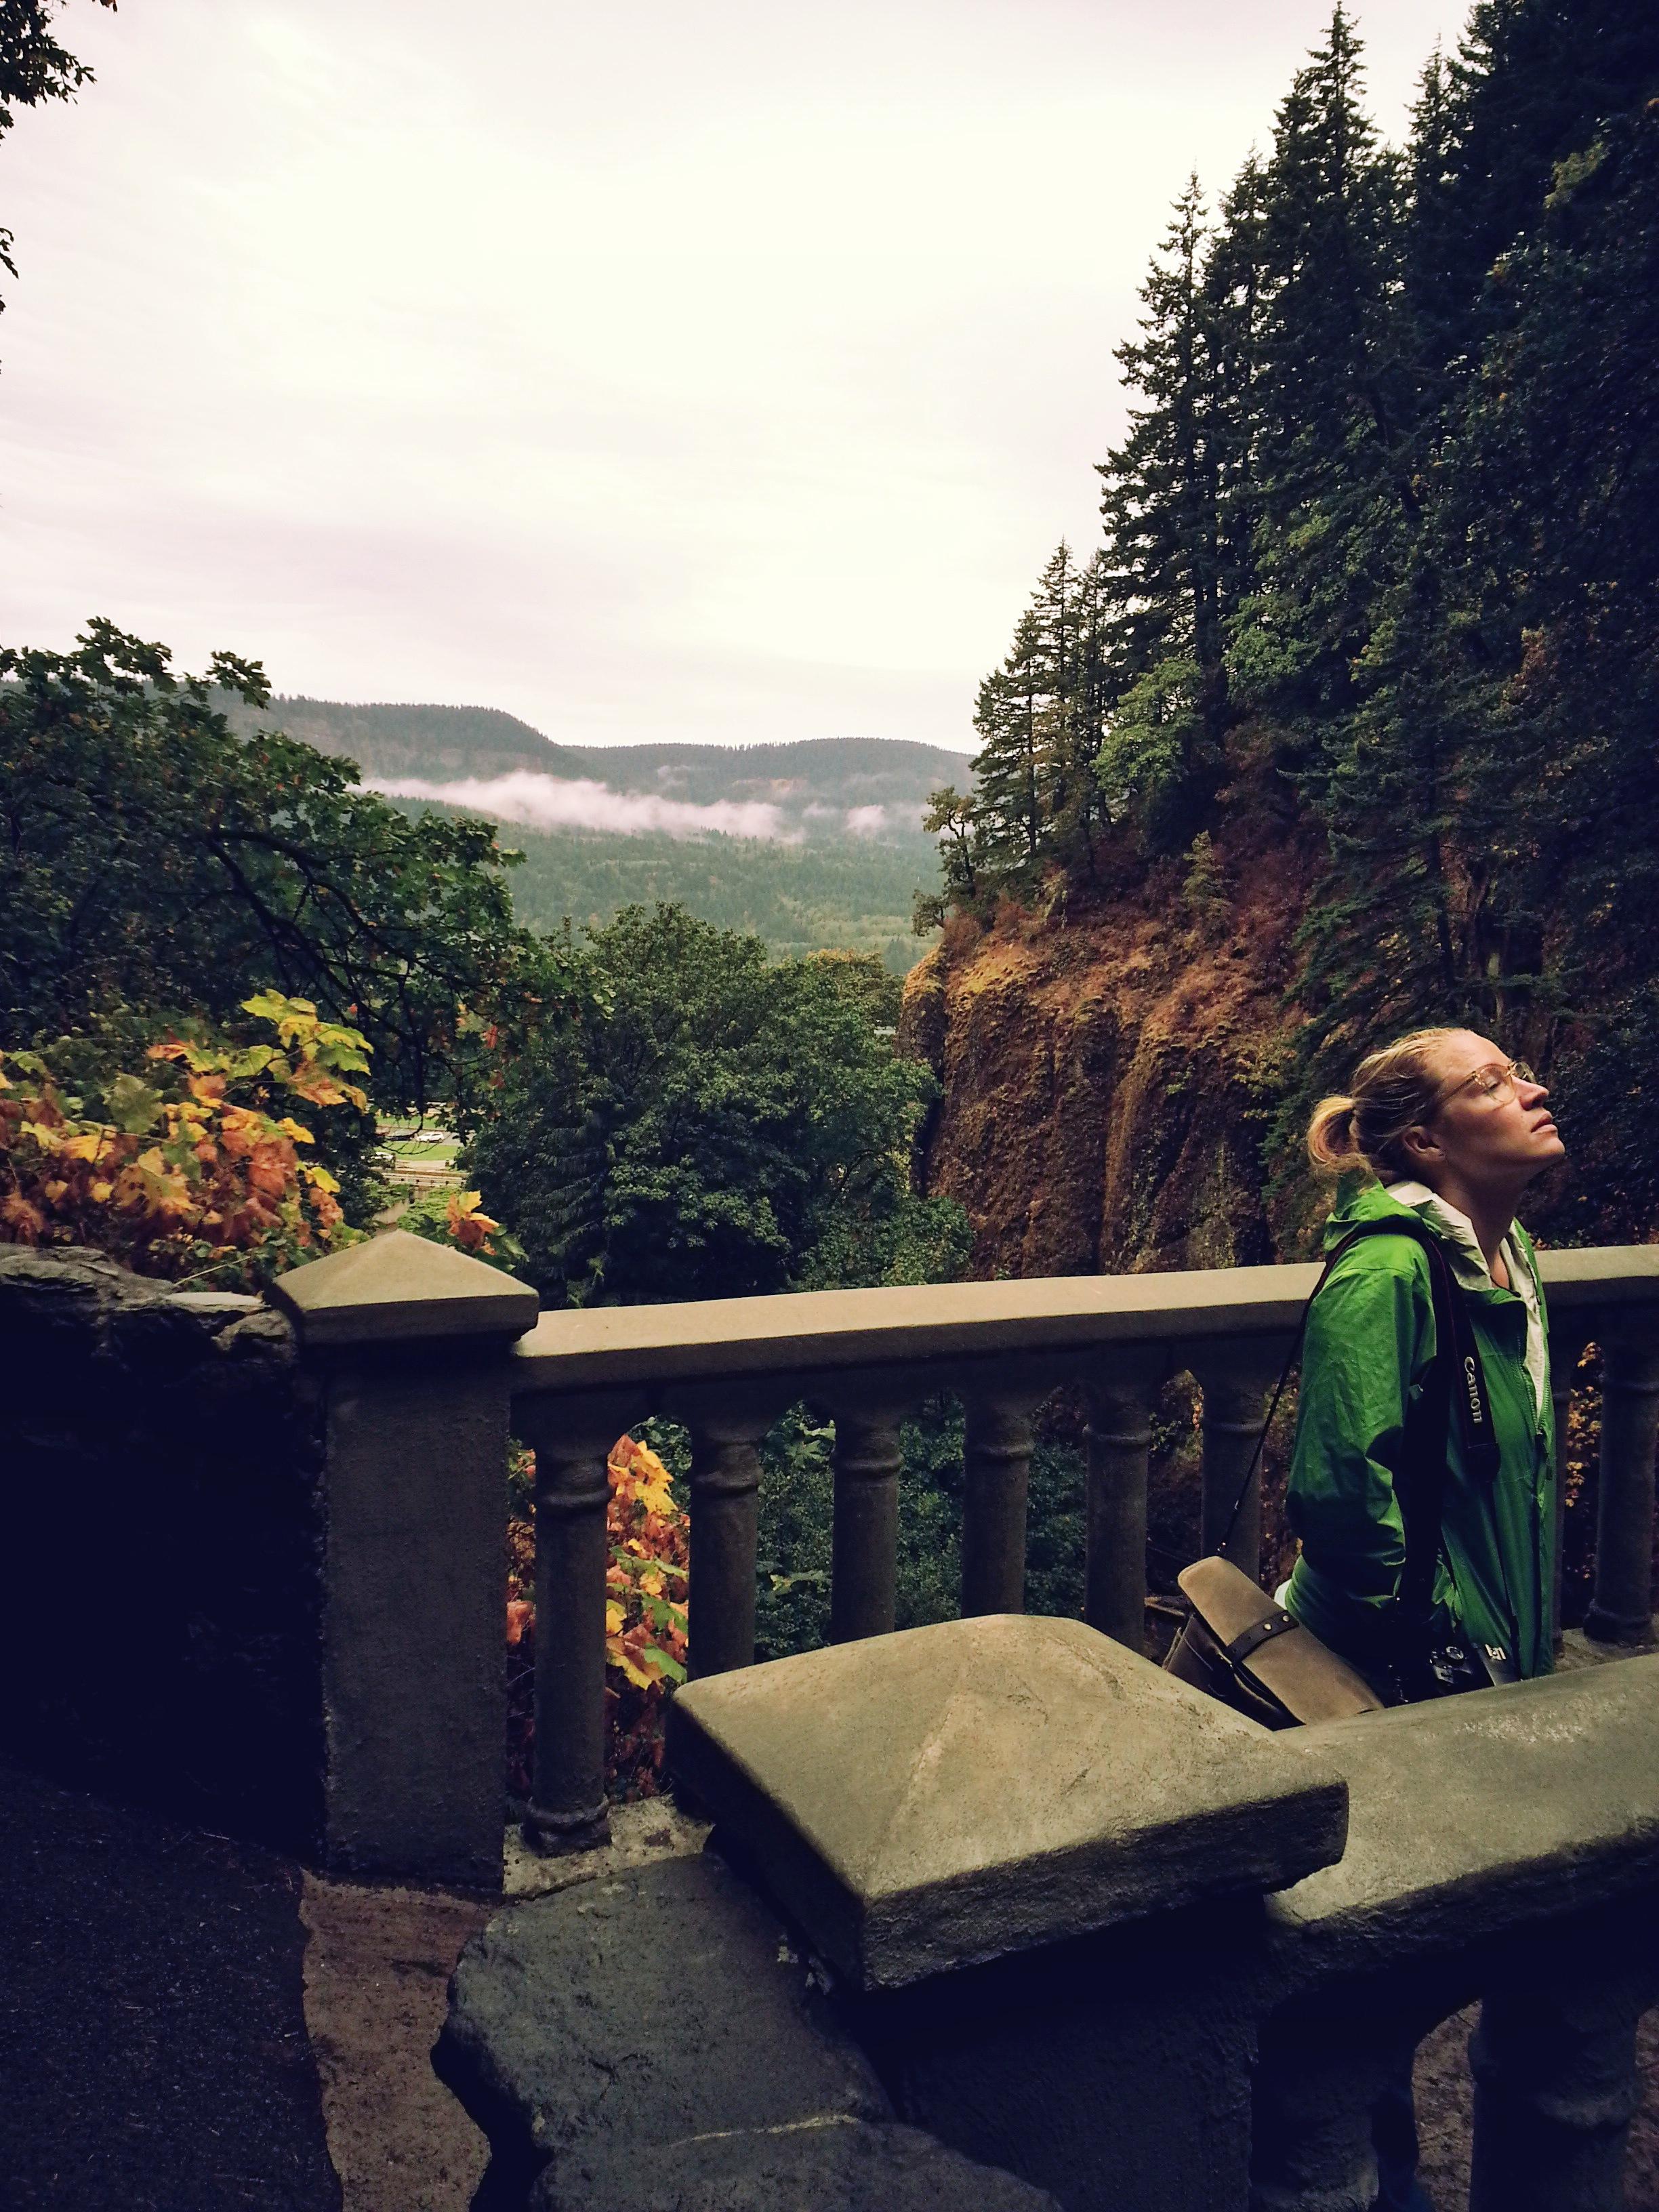 Multnomah-Falls-Heather_heatherbyhand.jpg